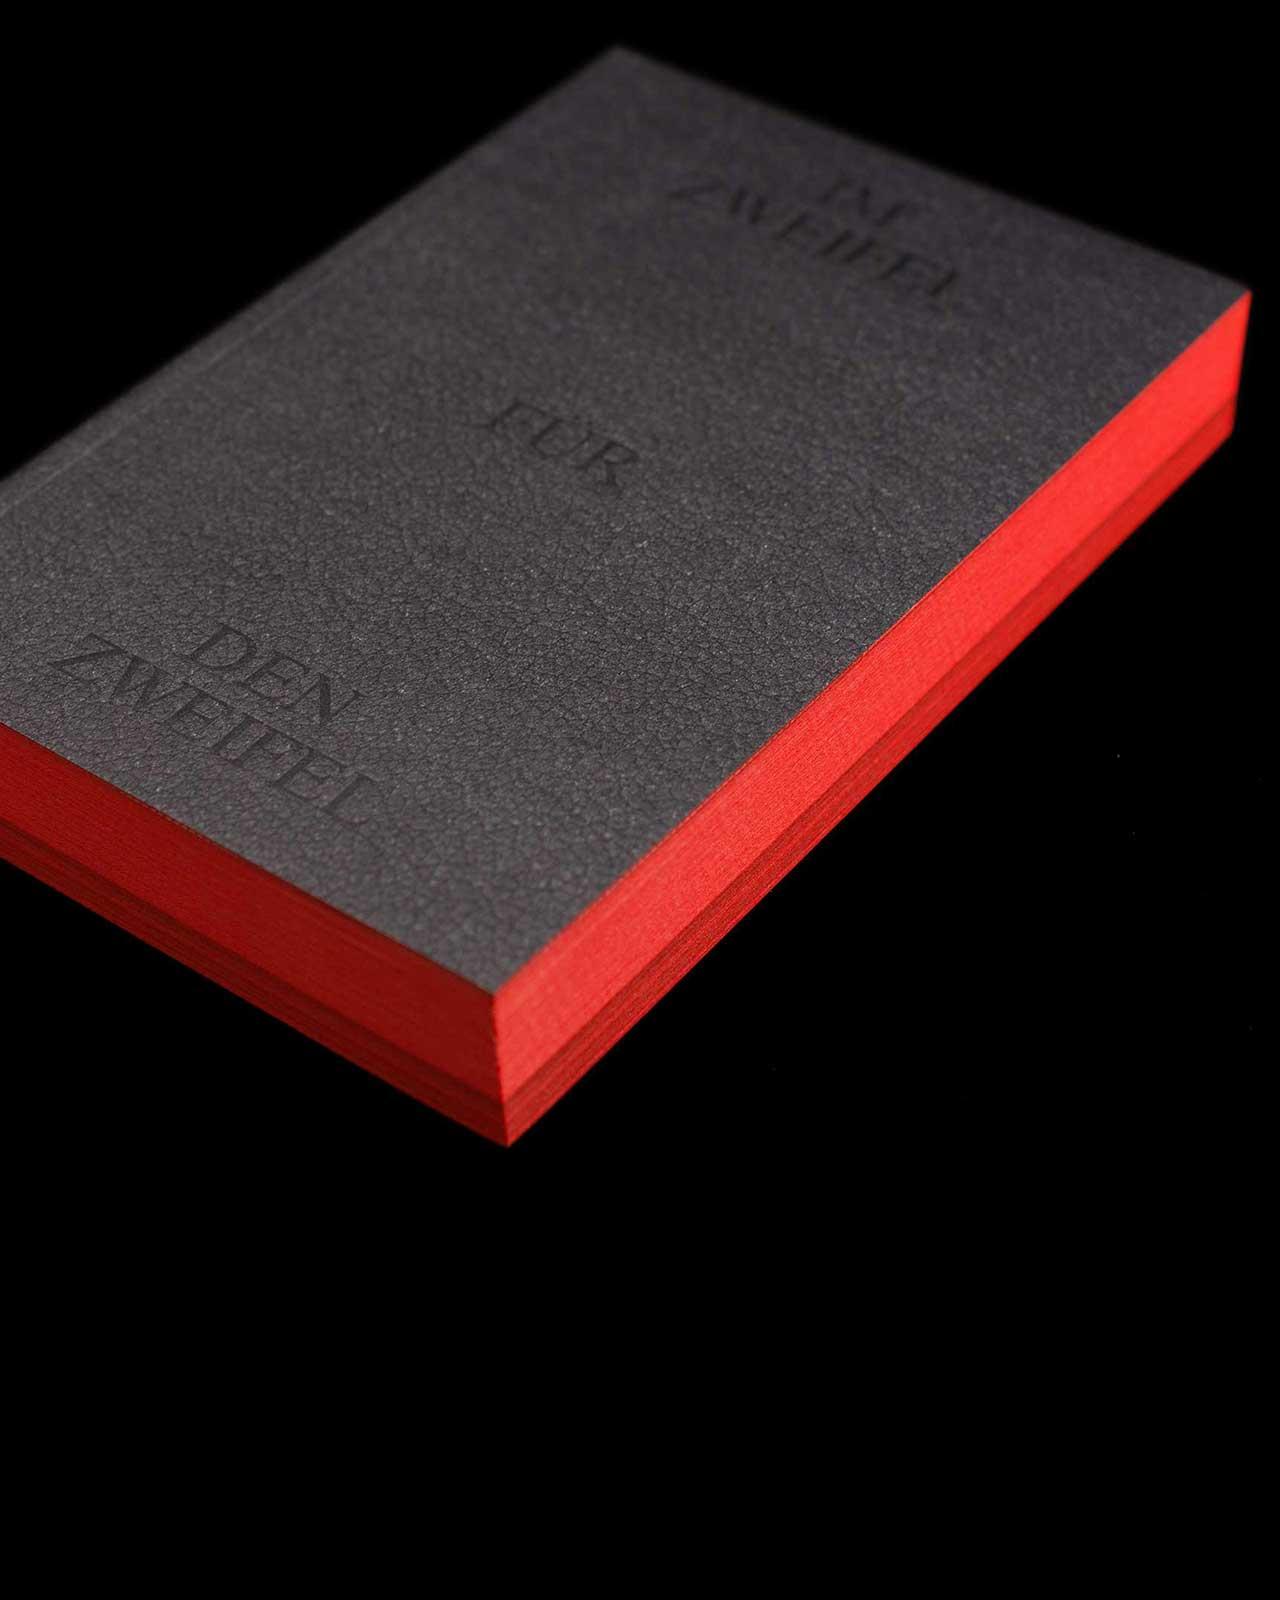 IZFDZ_Buch-cover-m